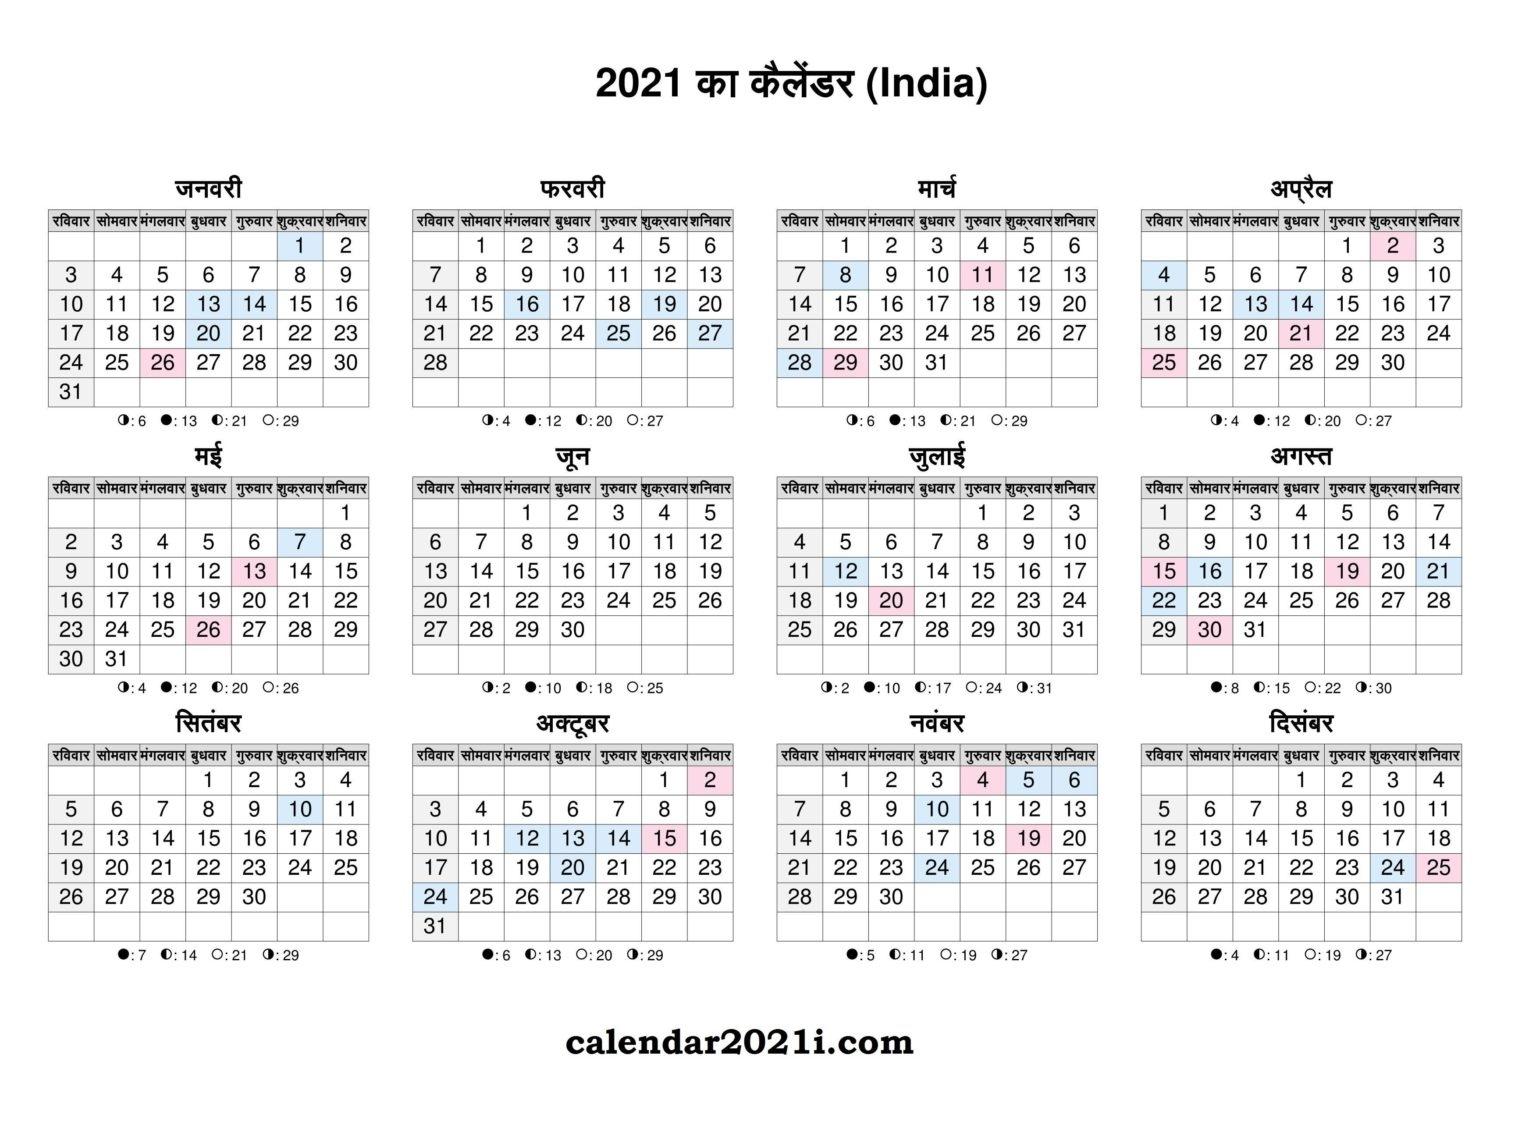 2021 India Calendar In Hindi With Holidays, Festivals | Calendar 2021 July 2021 Hindu Calendar In Hindi